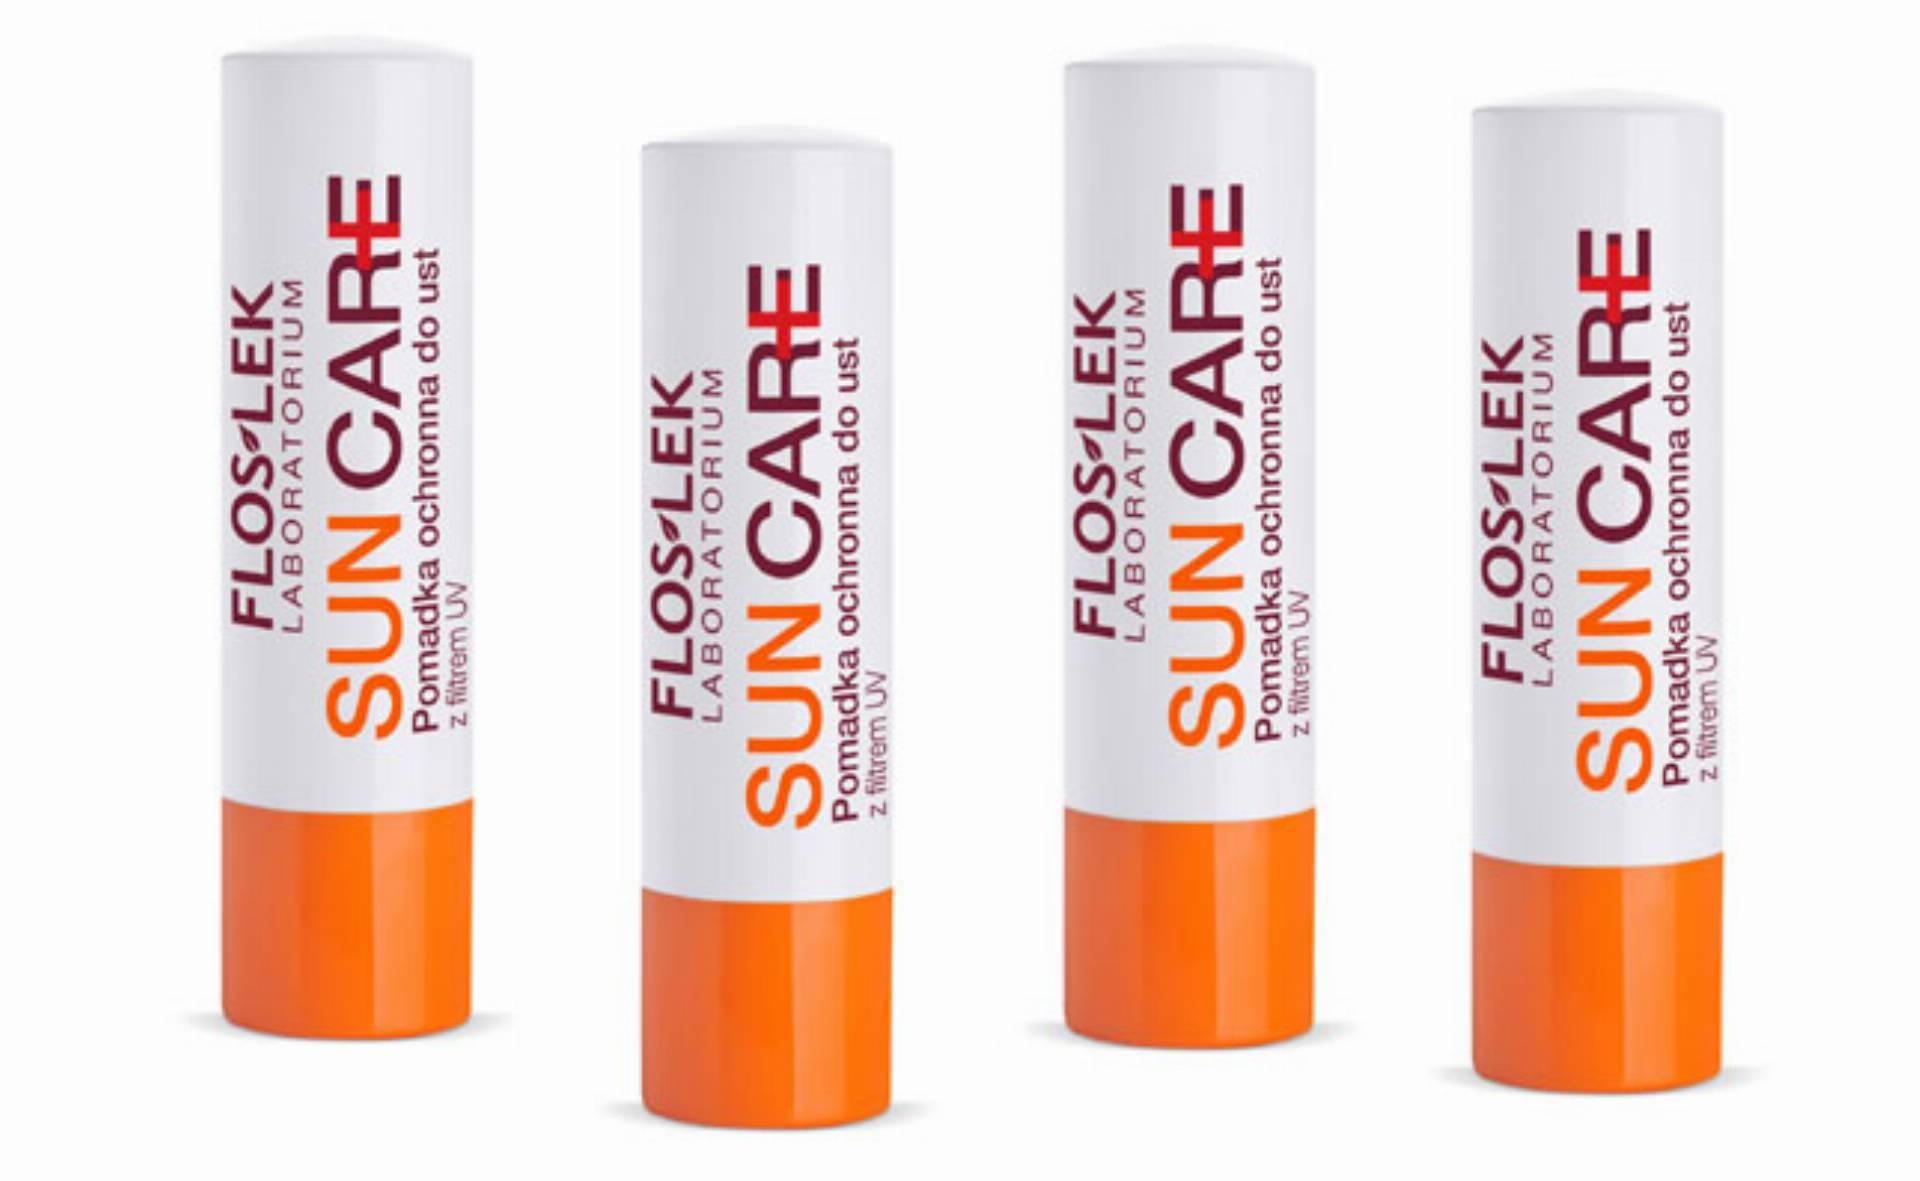 Nowość: Pomadka ochronna do ust z filtrem UV od Floslek – letnie SOS